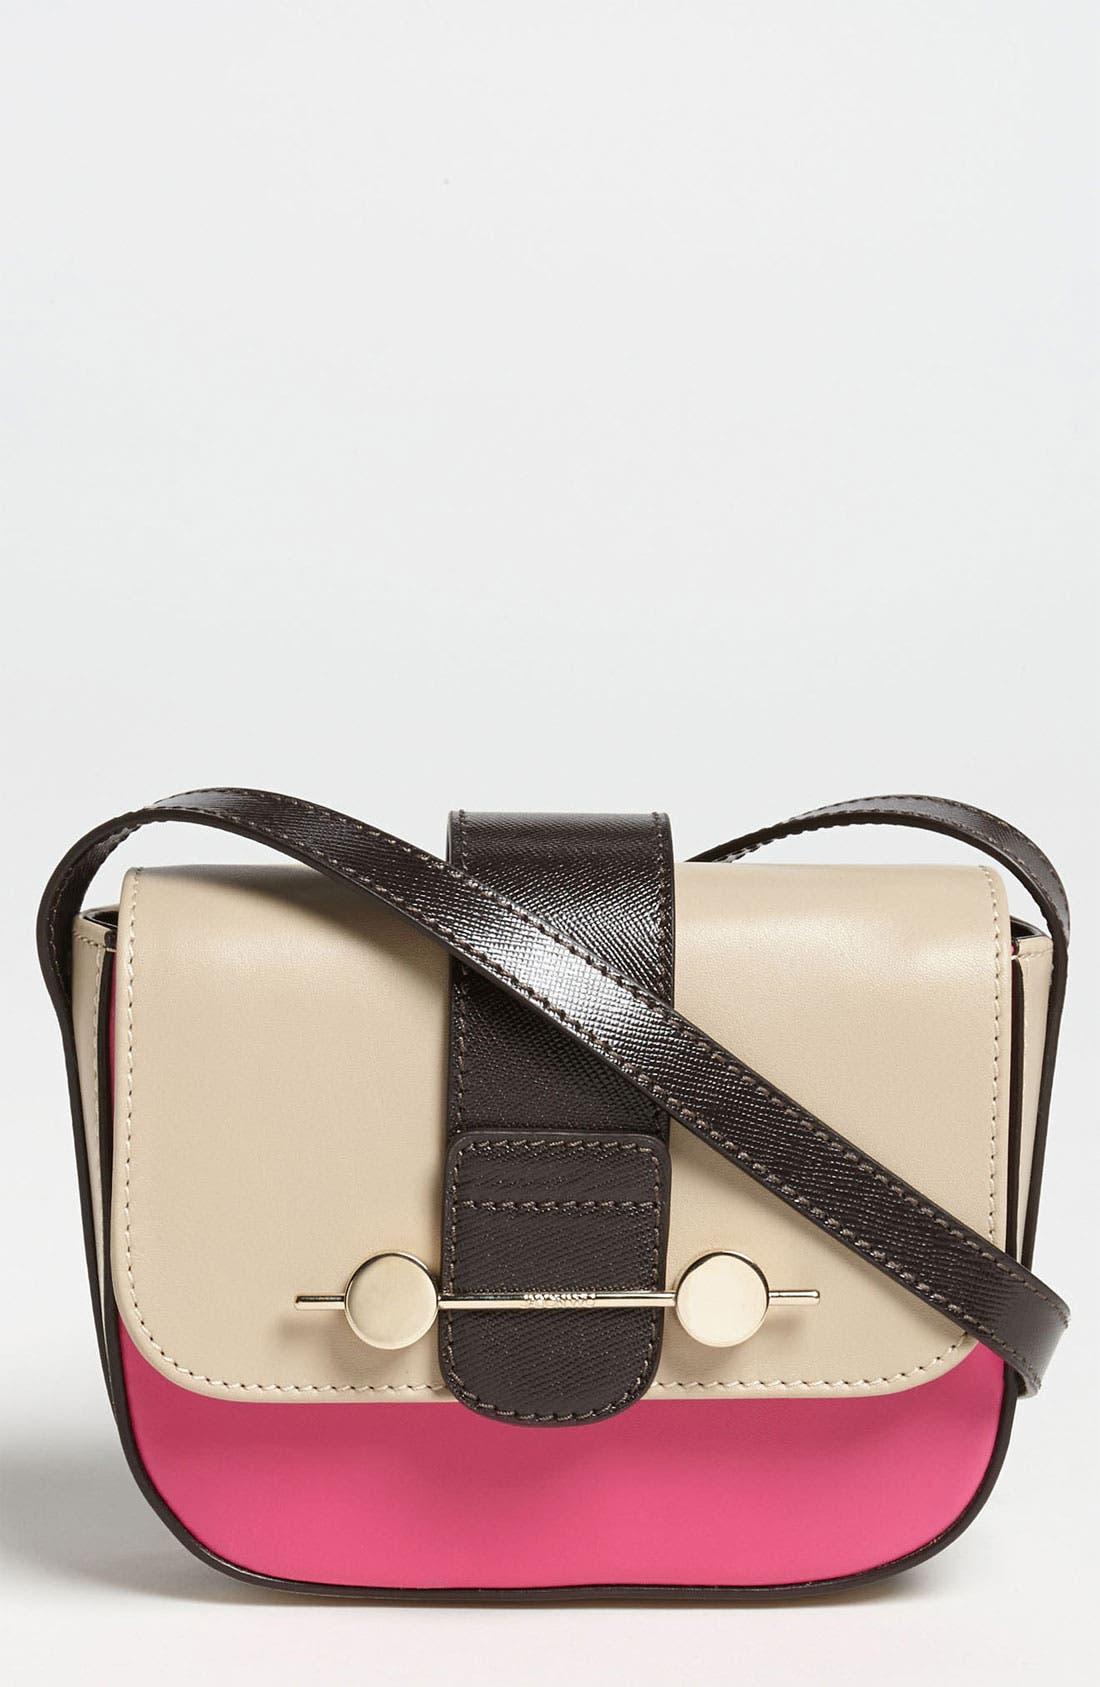 Main Image - Jason Wu 'Daphne - Mini' Crossbody Bag